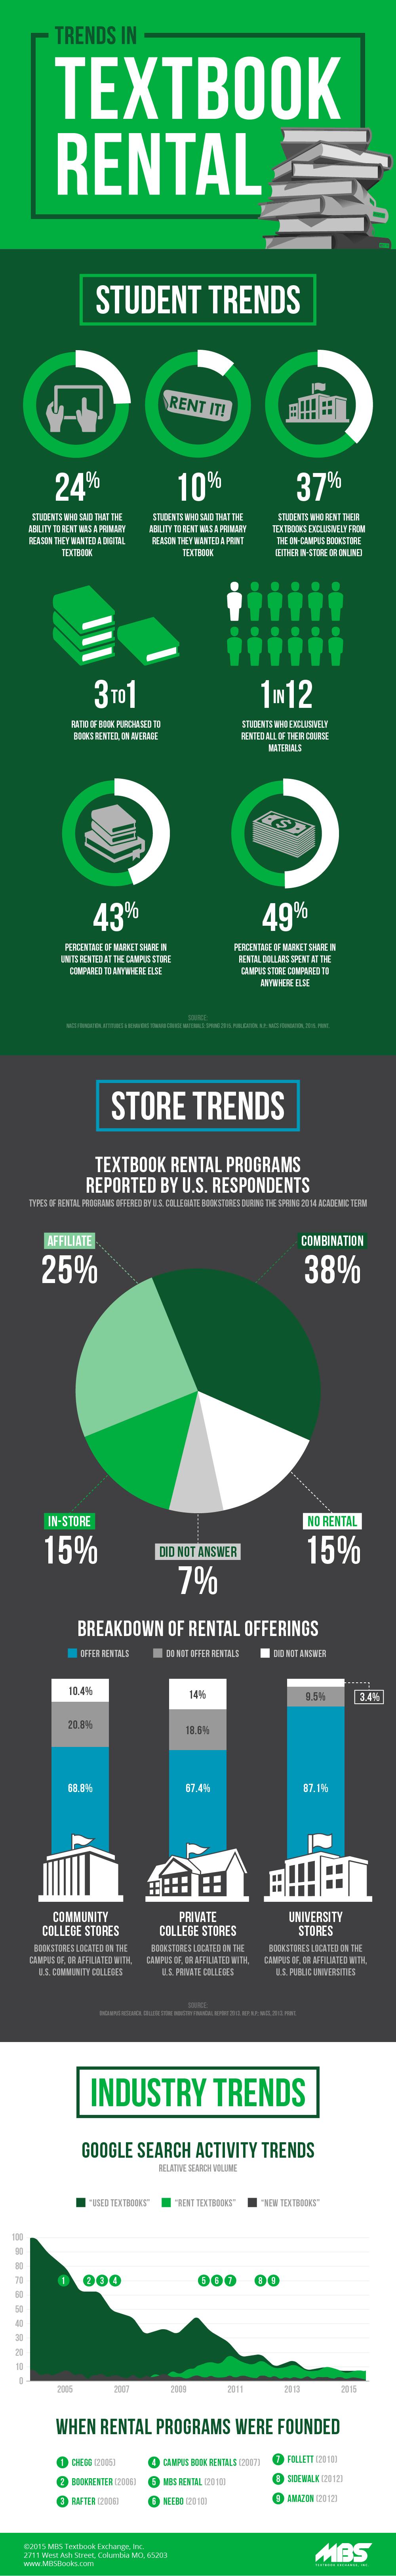 Trends in Textbook Rental